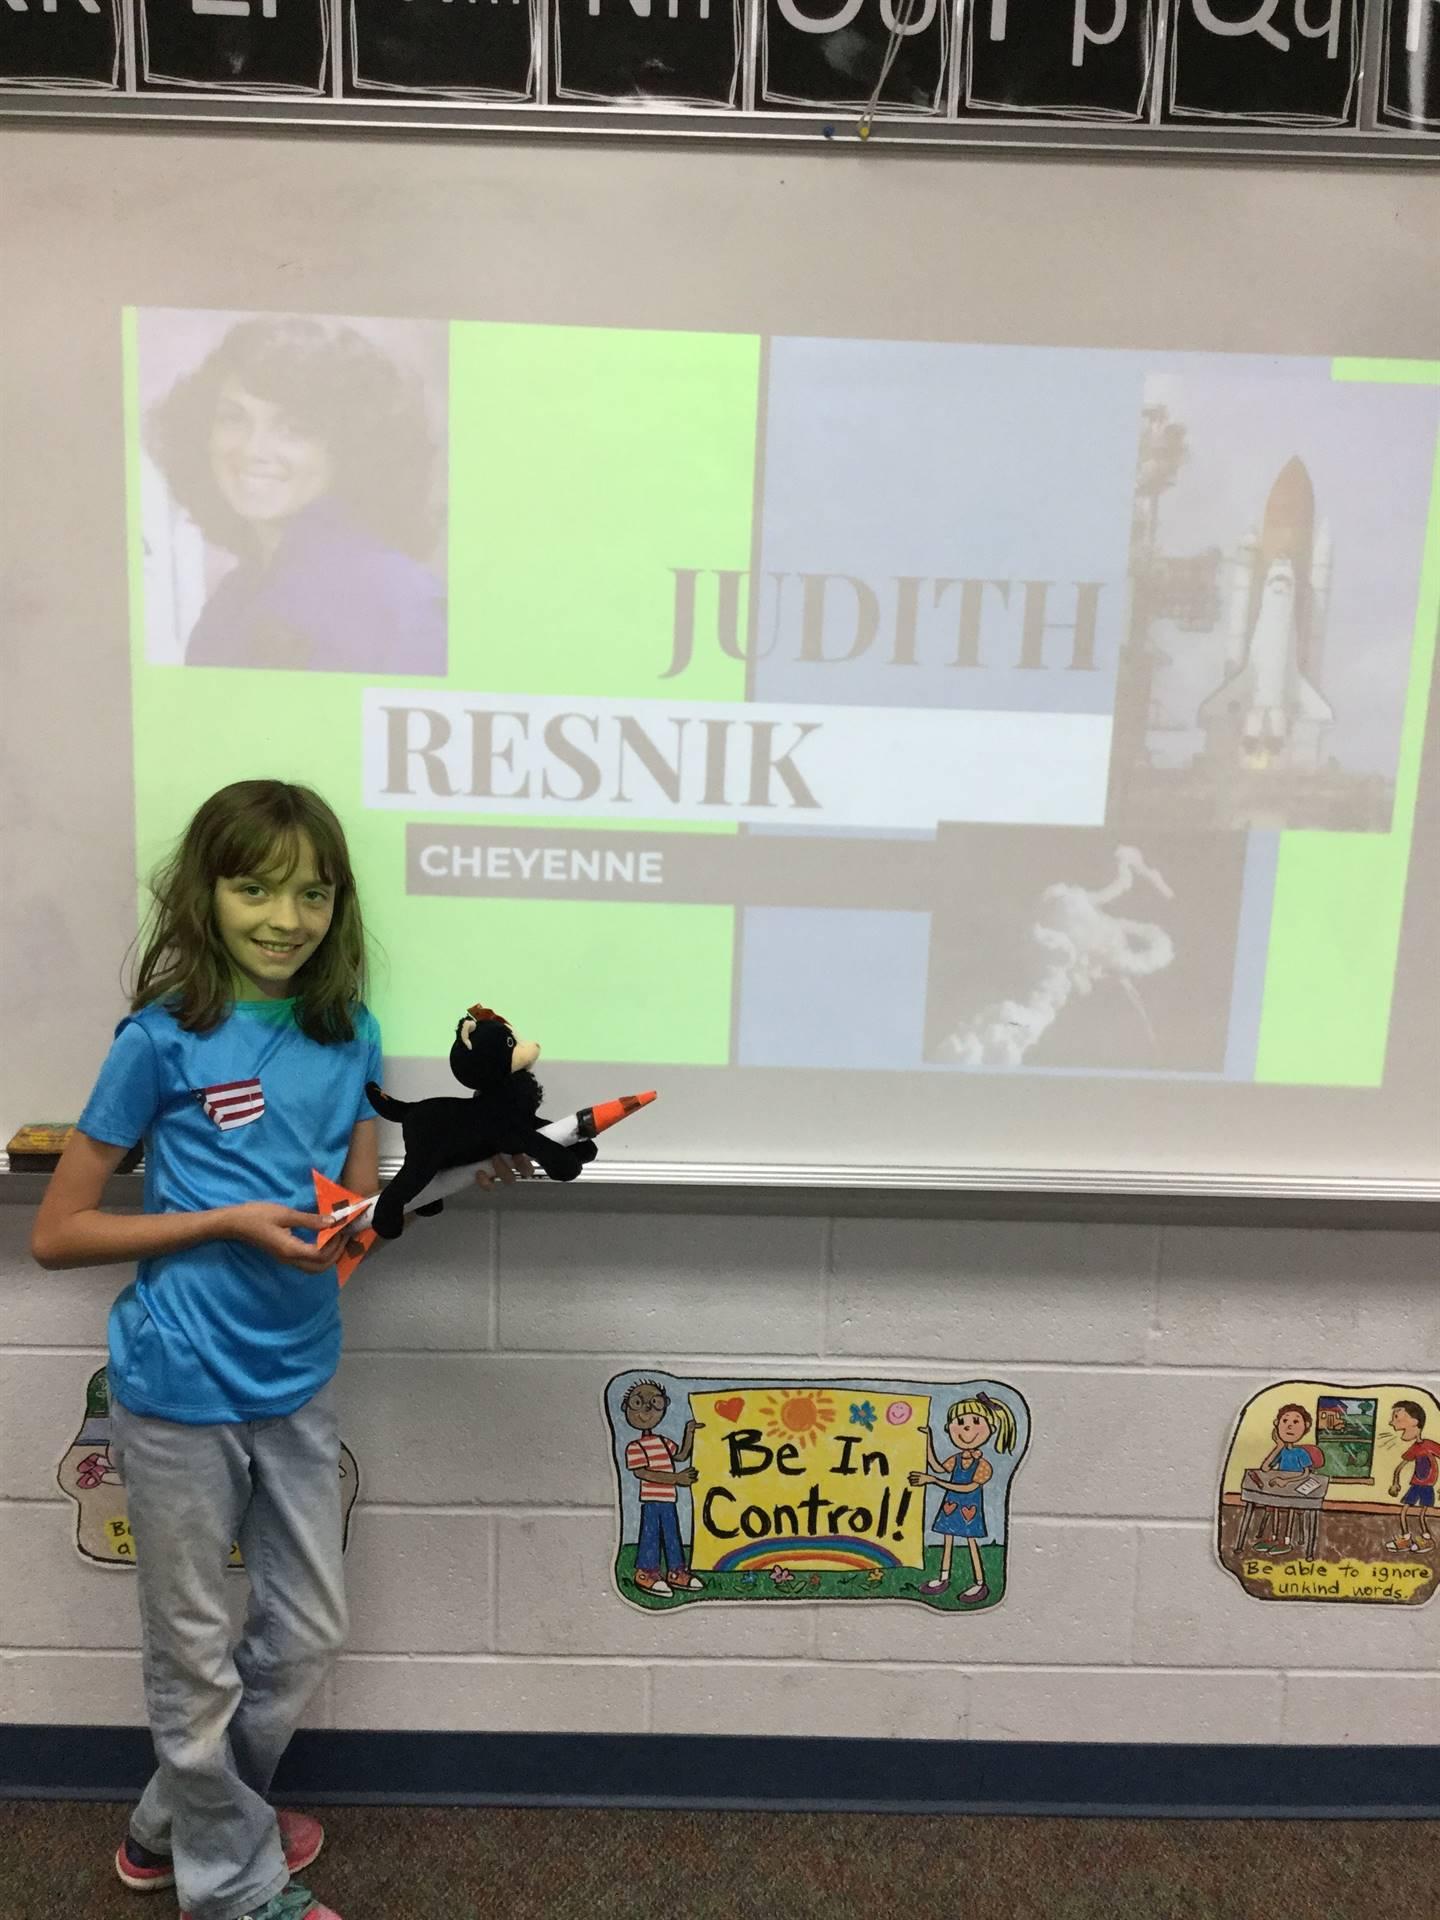 Cheyenne showing Judy Resnik